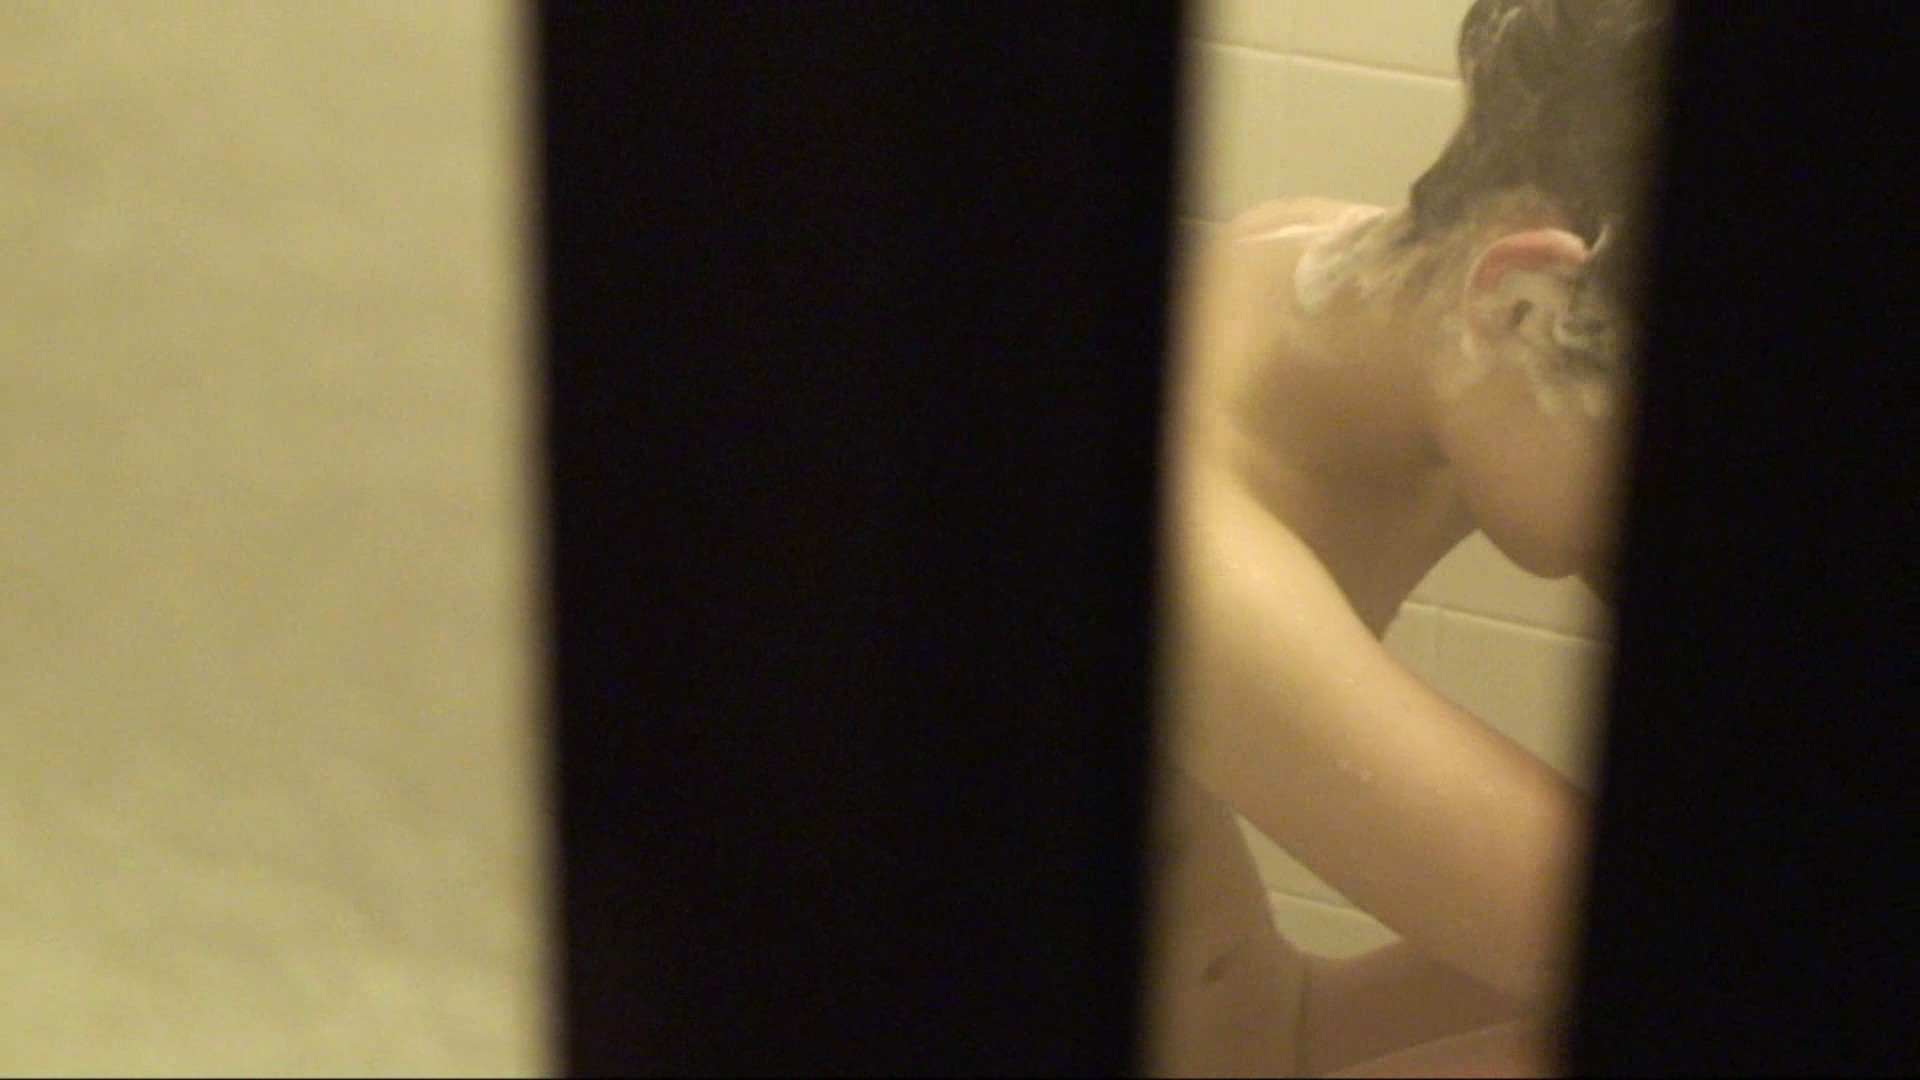 vol.02超可愛すぎる彼女の裸体をハイビジョンで!至近距離での眺め最高! 覗き 隠し撮りオマンコ動画紹介 103pic 29